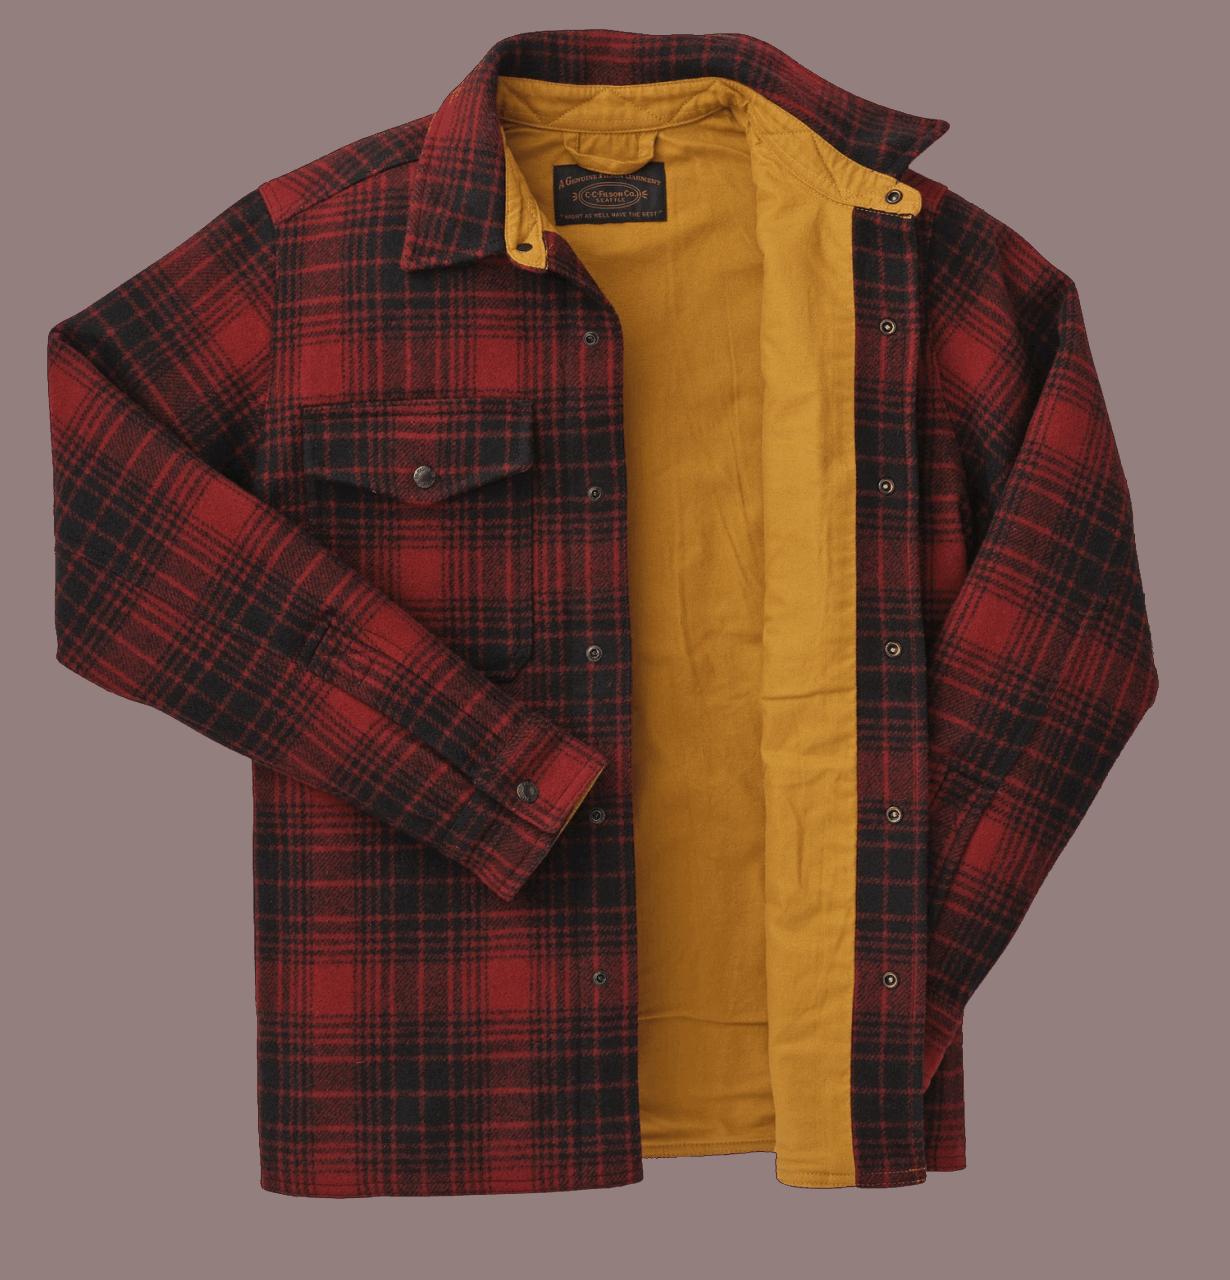 Filson Mackinaw Jac Shirt - oxblood/black